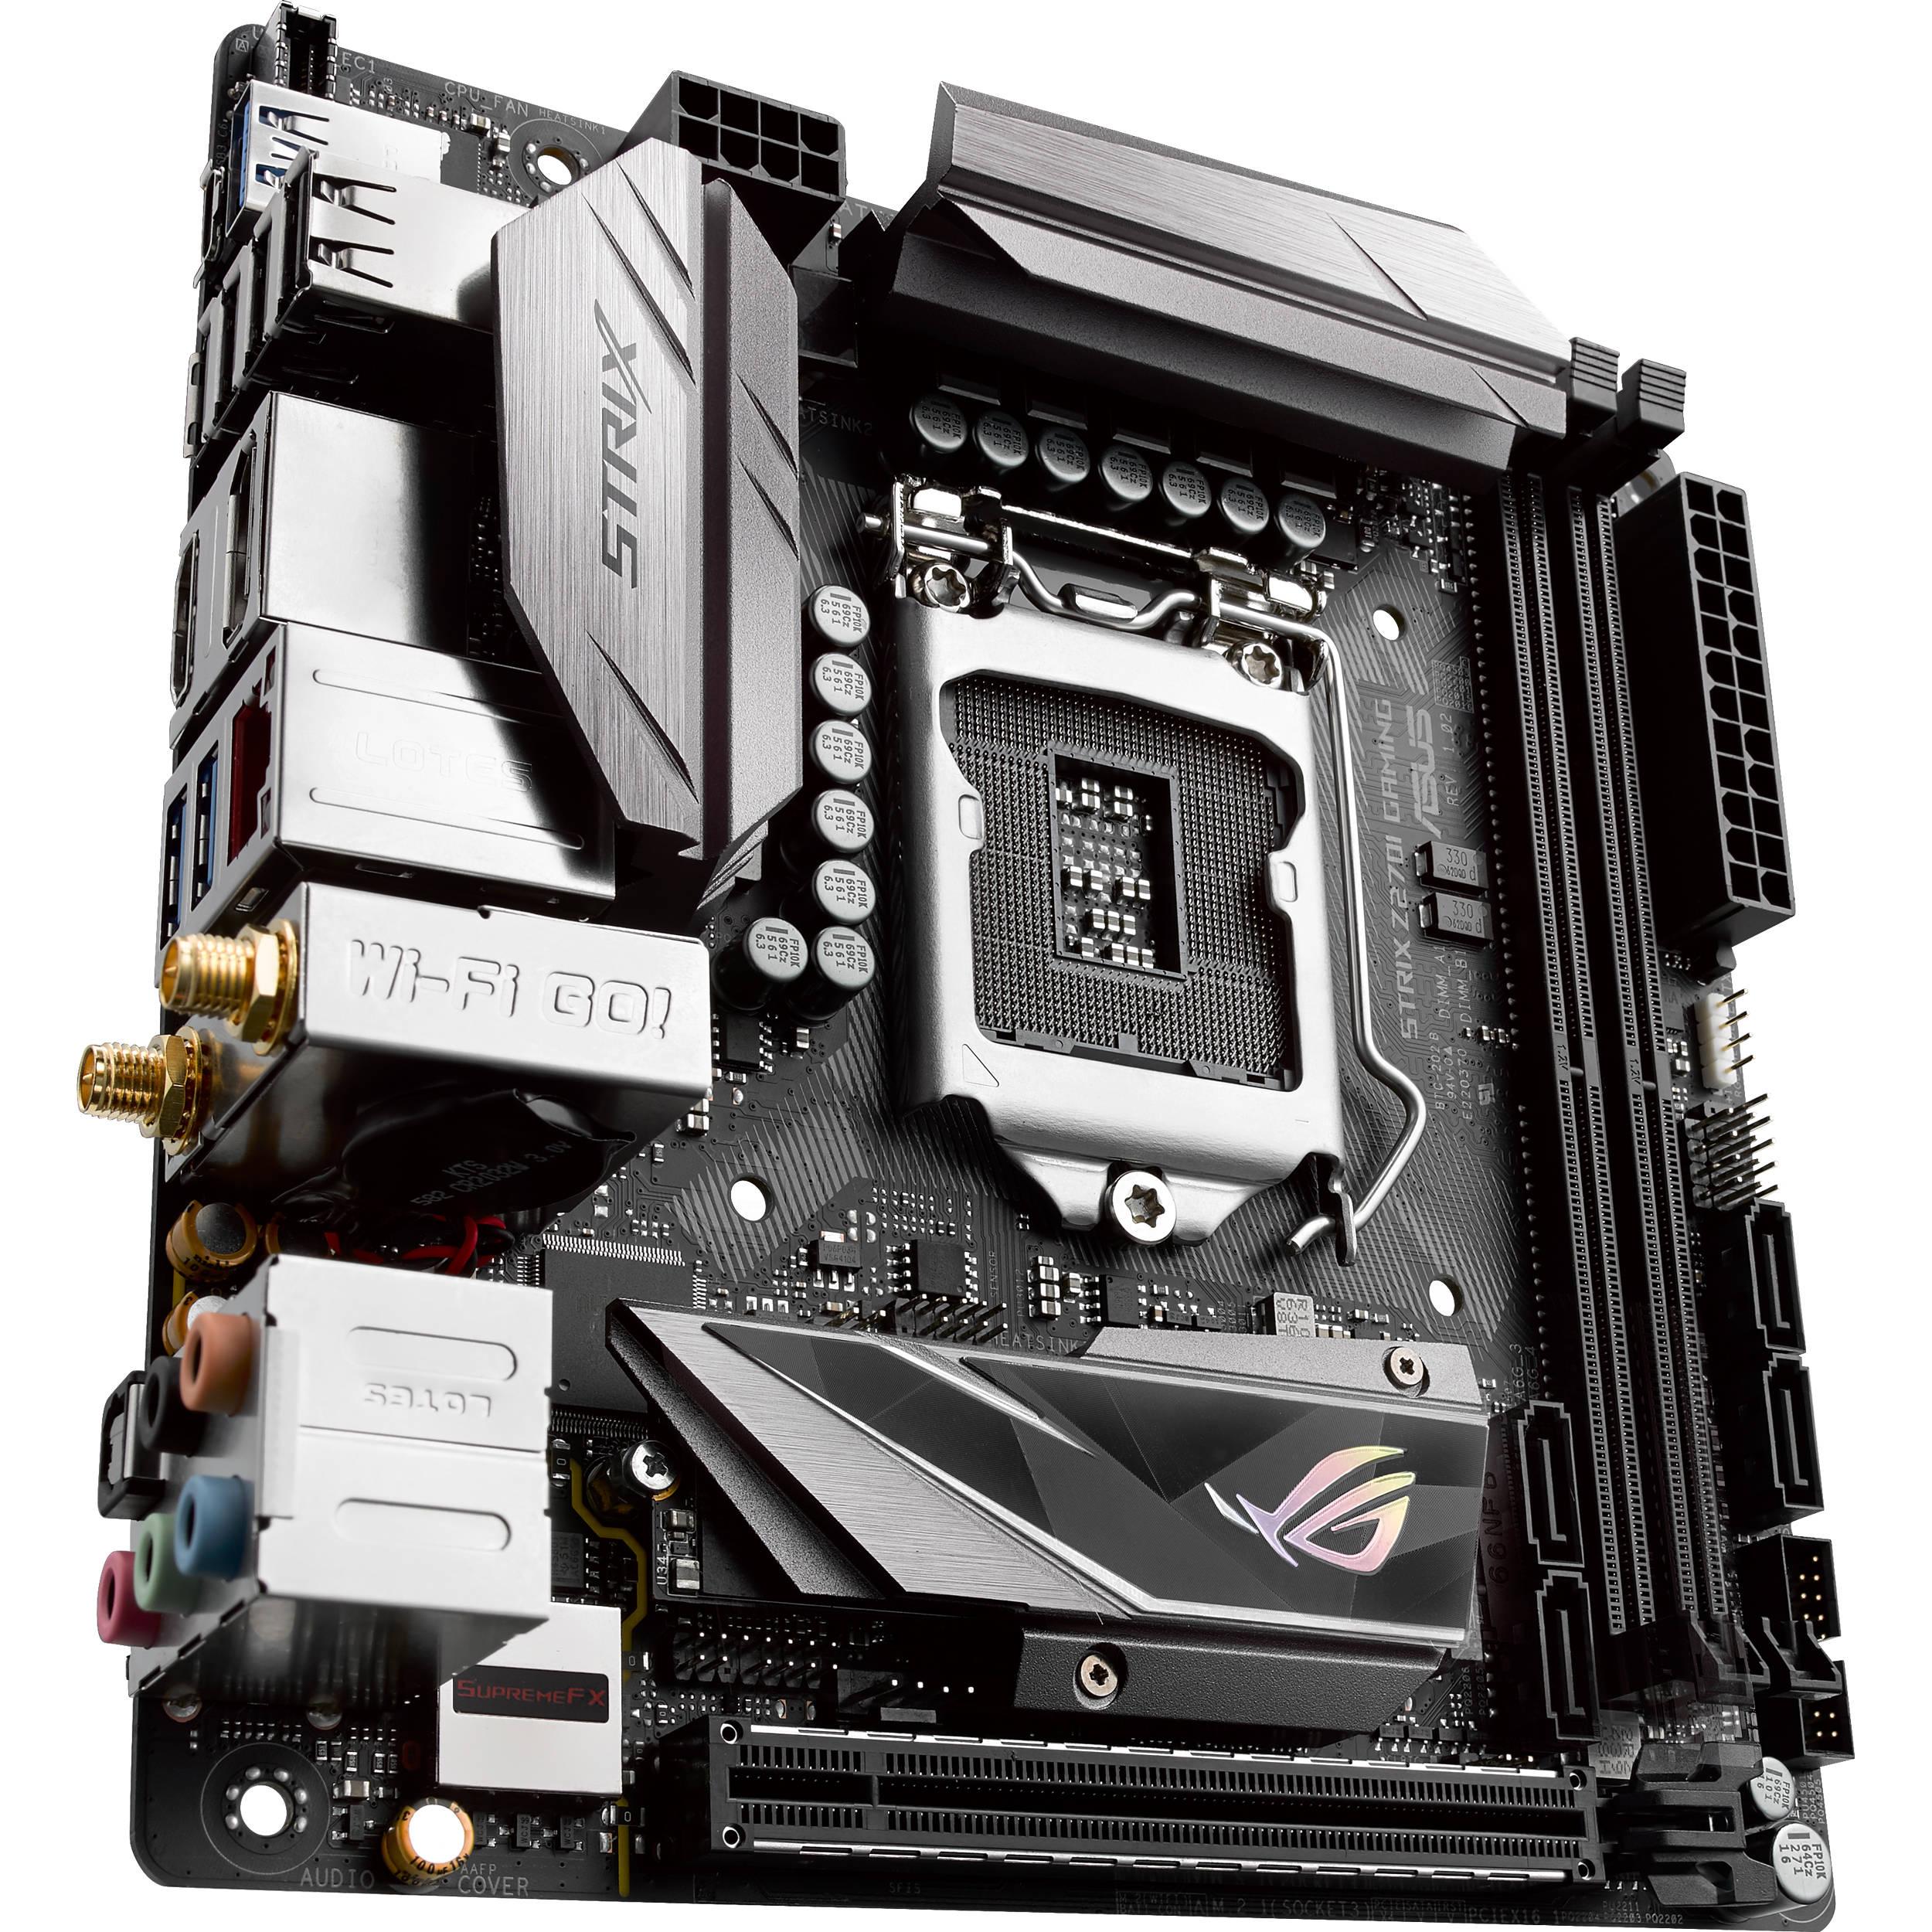 ASUS Republic of Gamers Strix Z270I Gaming LGA 1151 Mini-ITX Motherboard